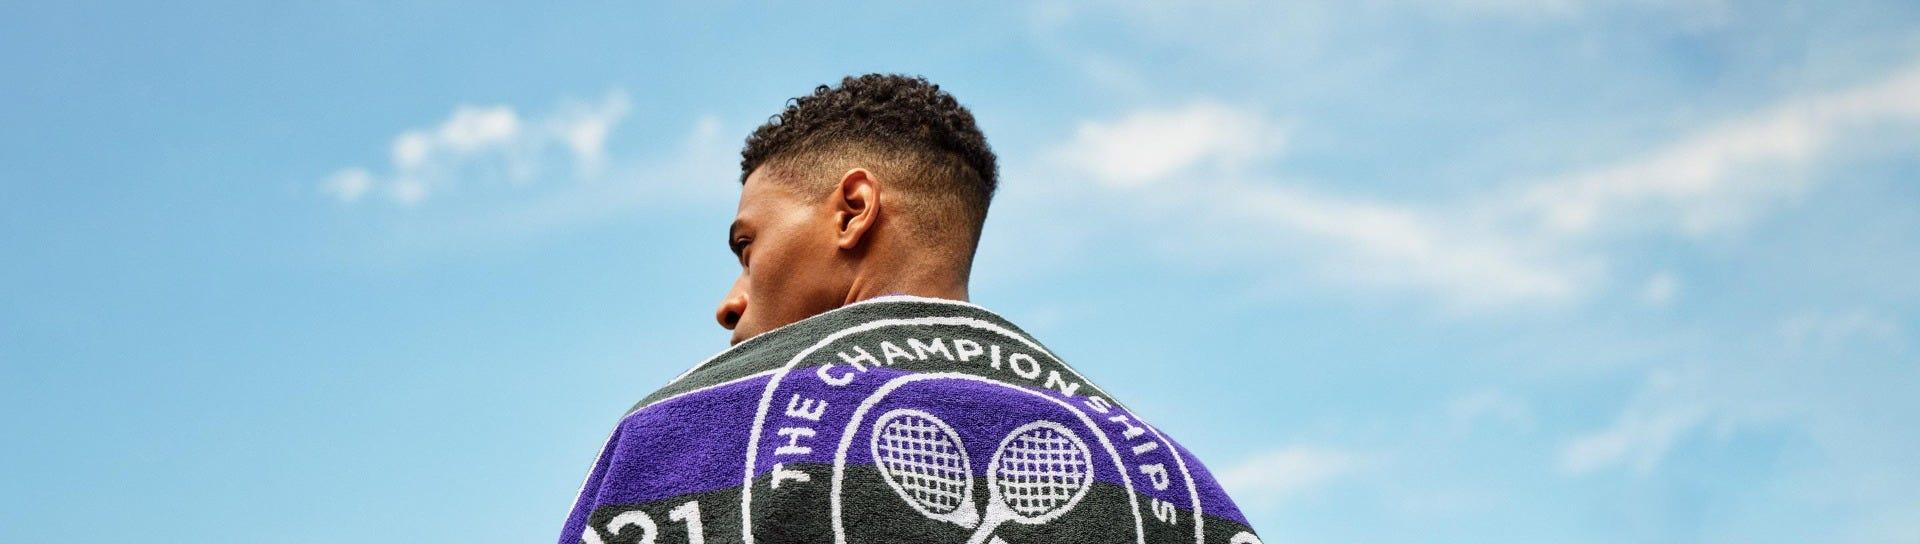 Wimbledon Active Sportswear Bucket Hat - White